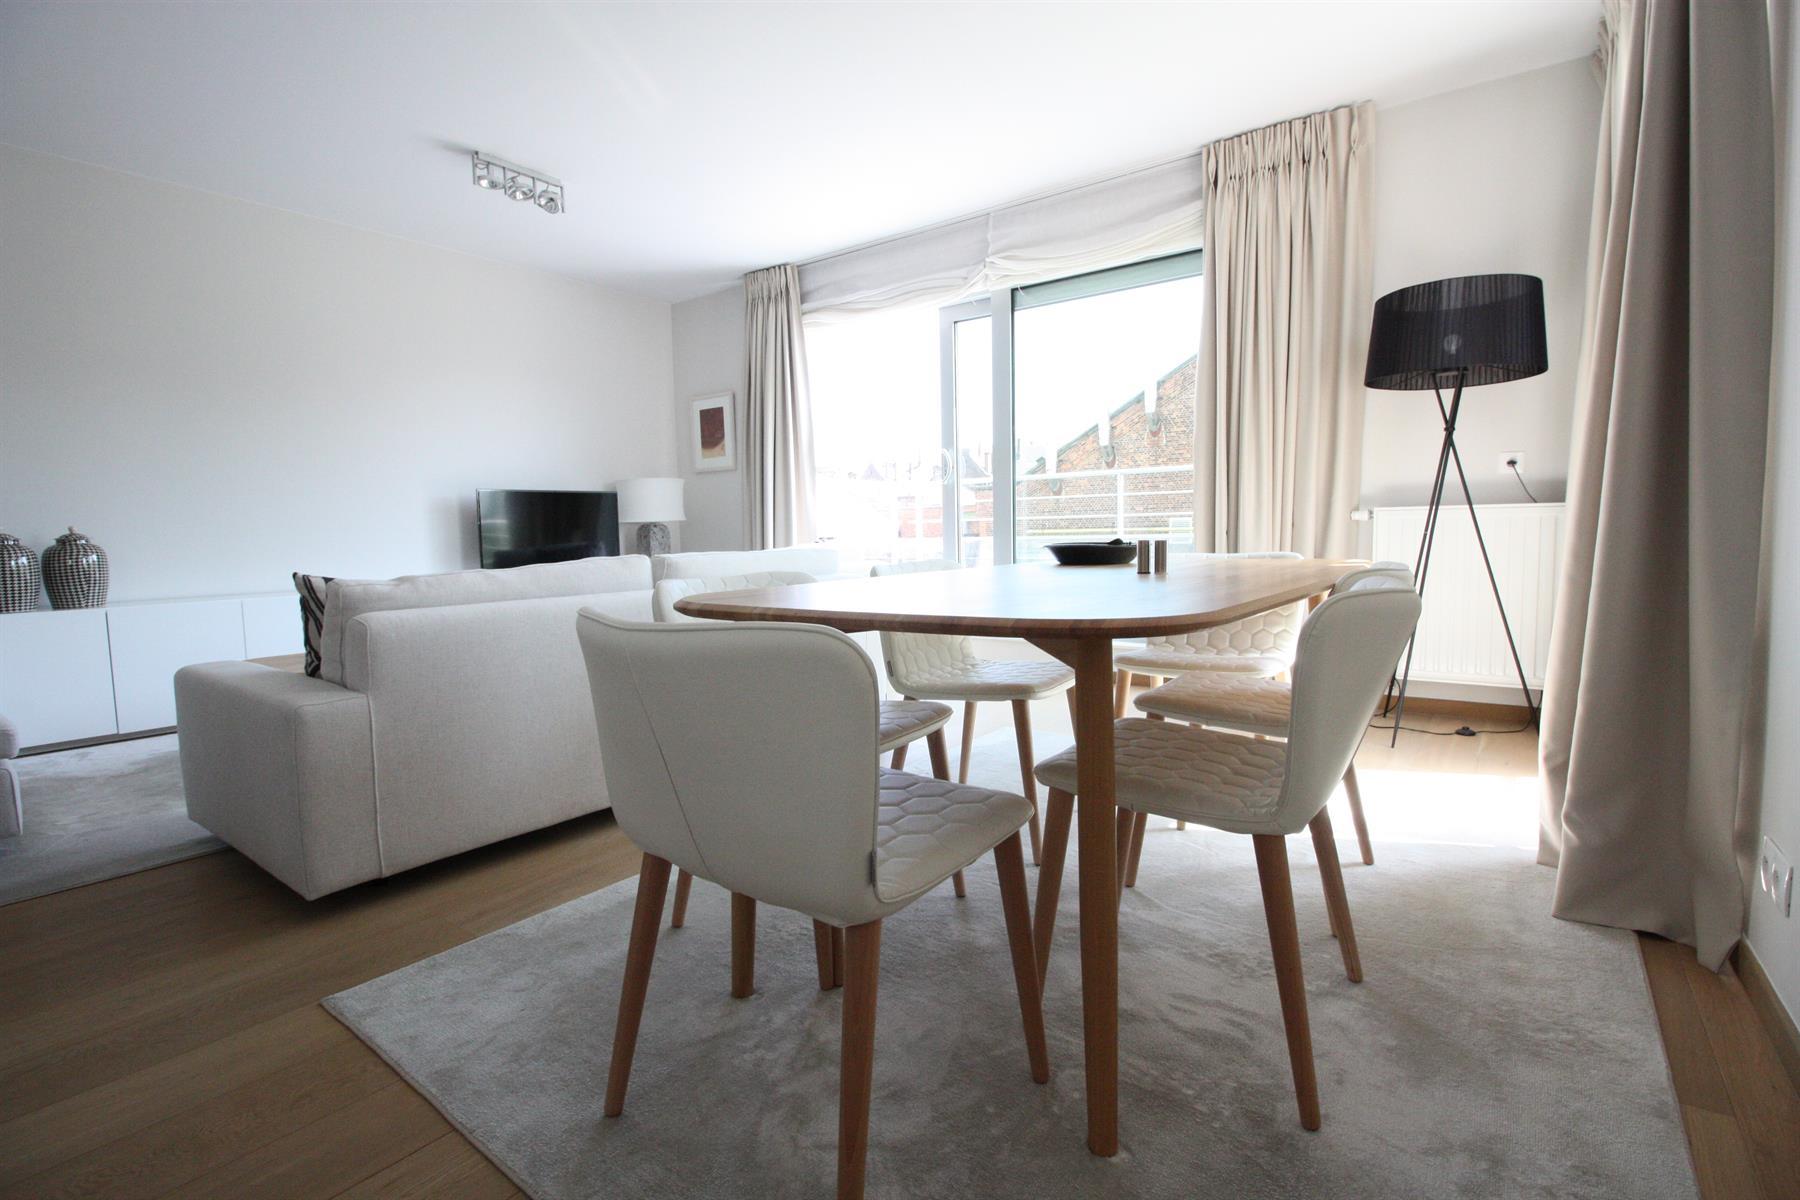 Flat - Etterbeek - #3978340-6